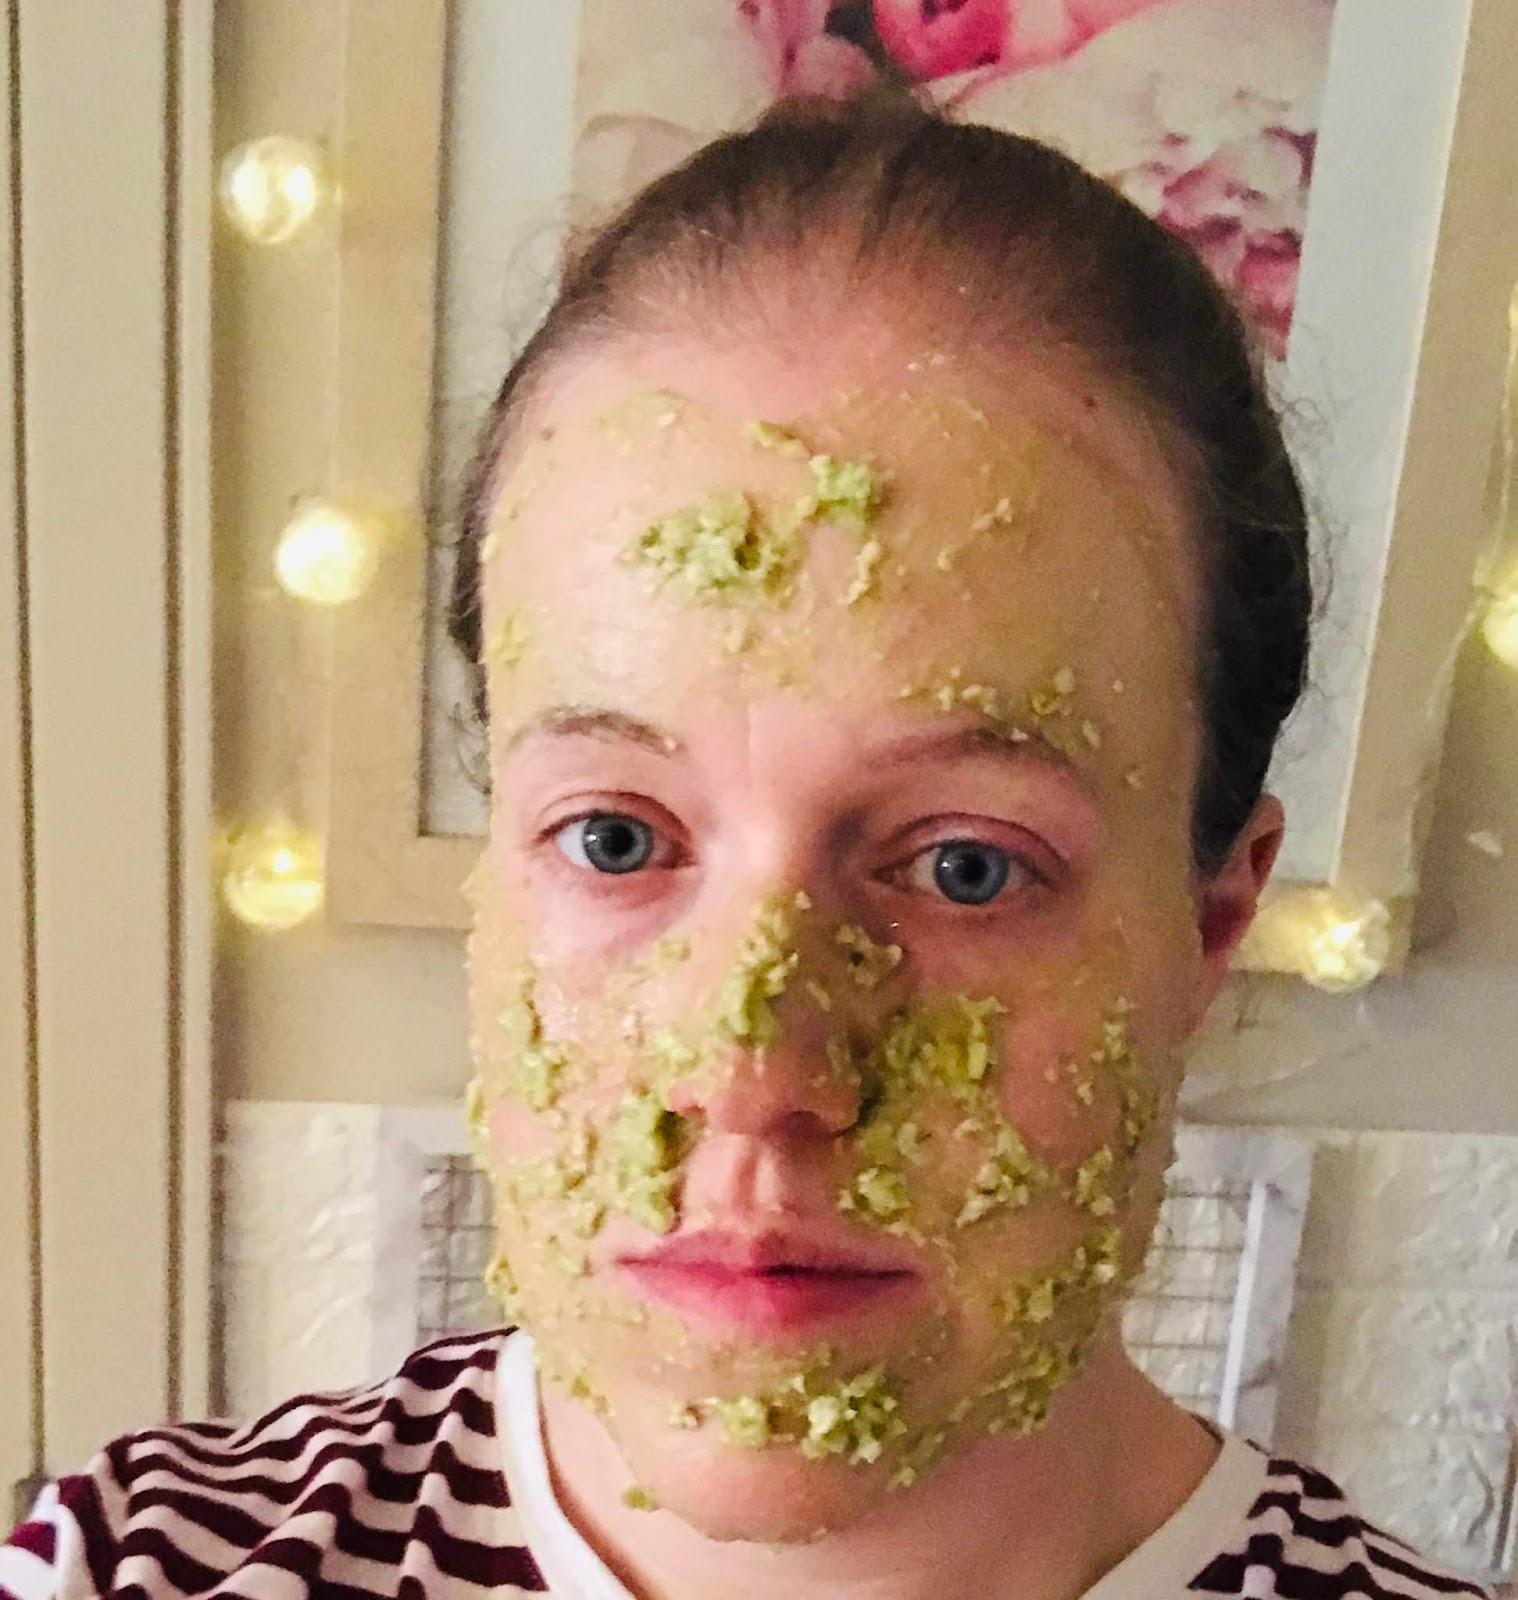 DIY facemask avocado and honey